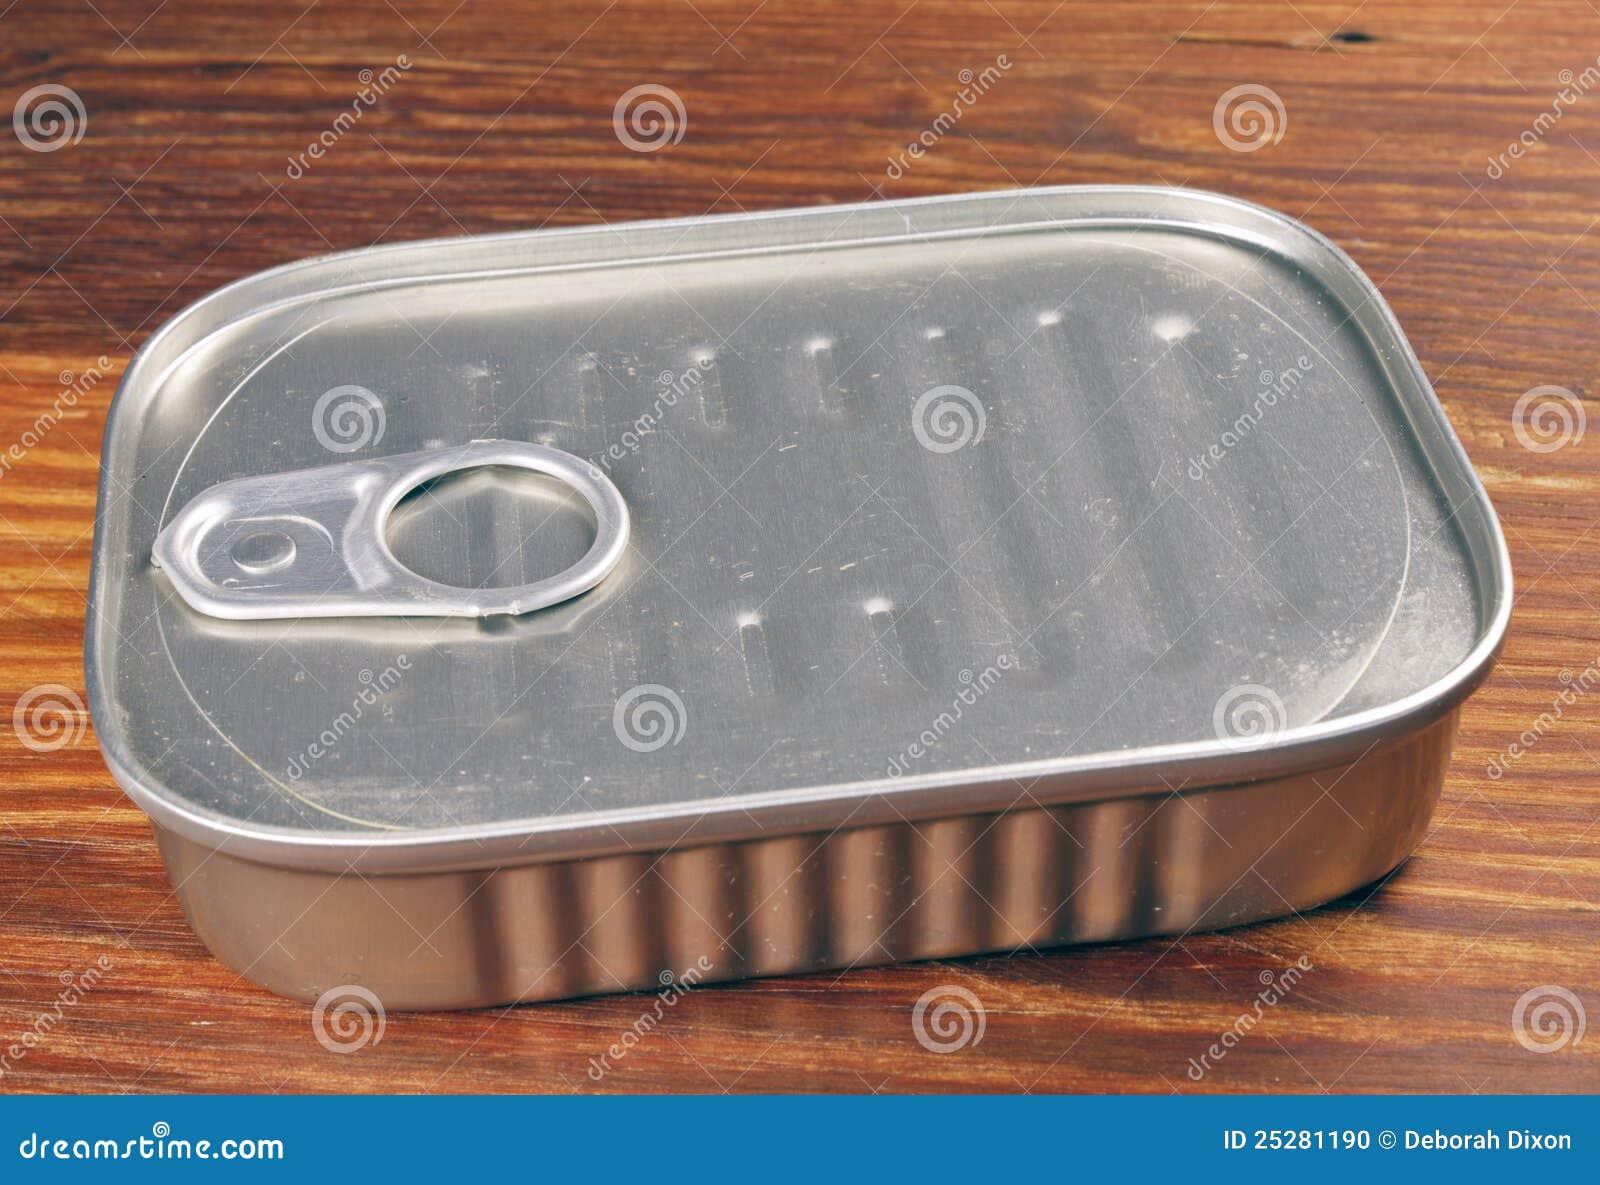 Sardine can stock photo image 25281190 Empty sardine cans